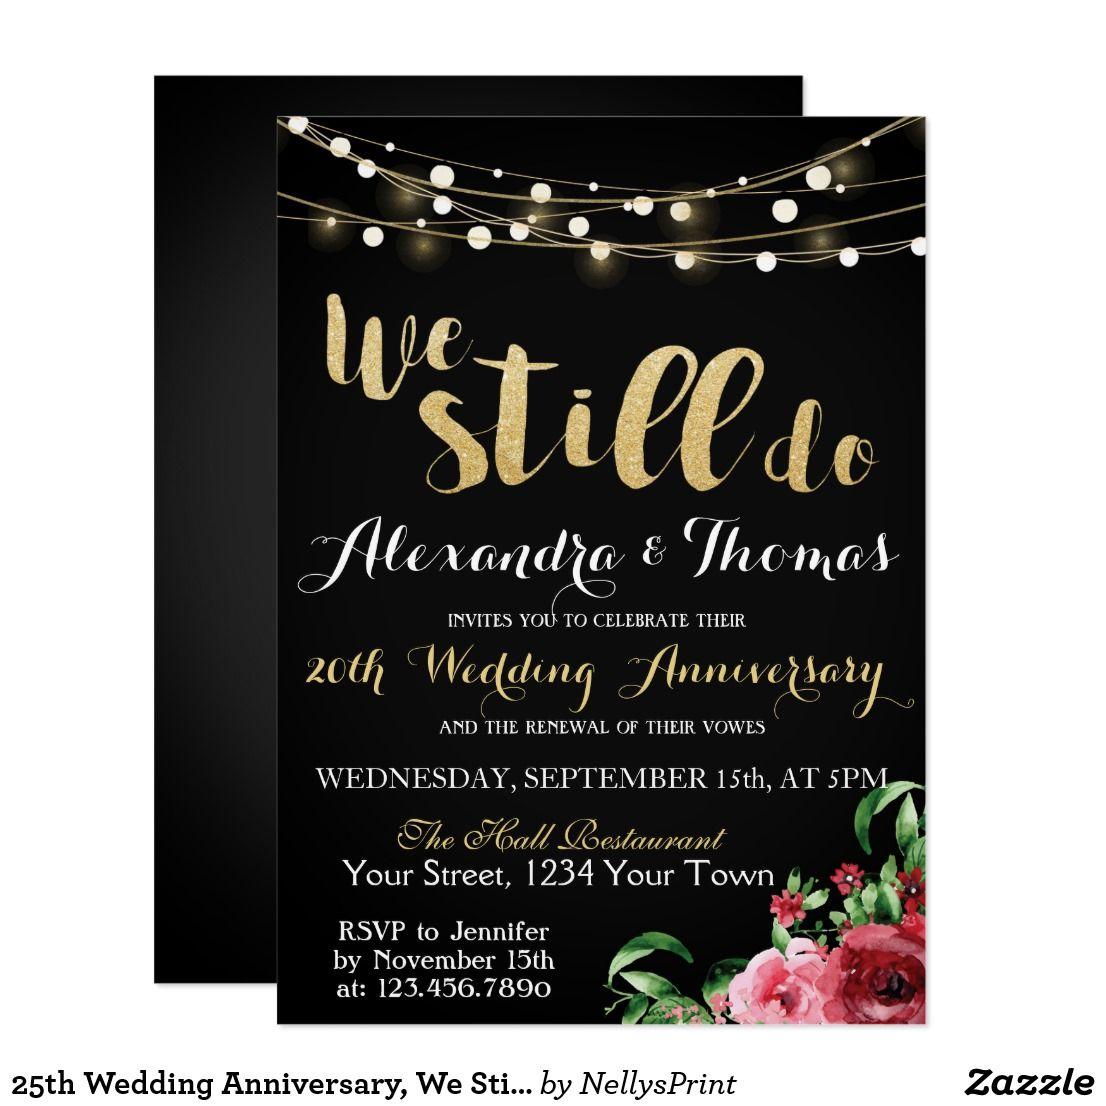 25th Wedding Anniversary, We Still do Anniversary